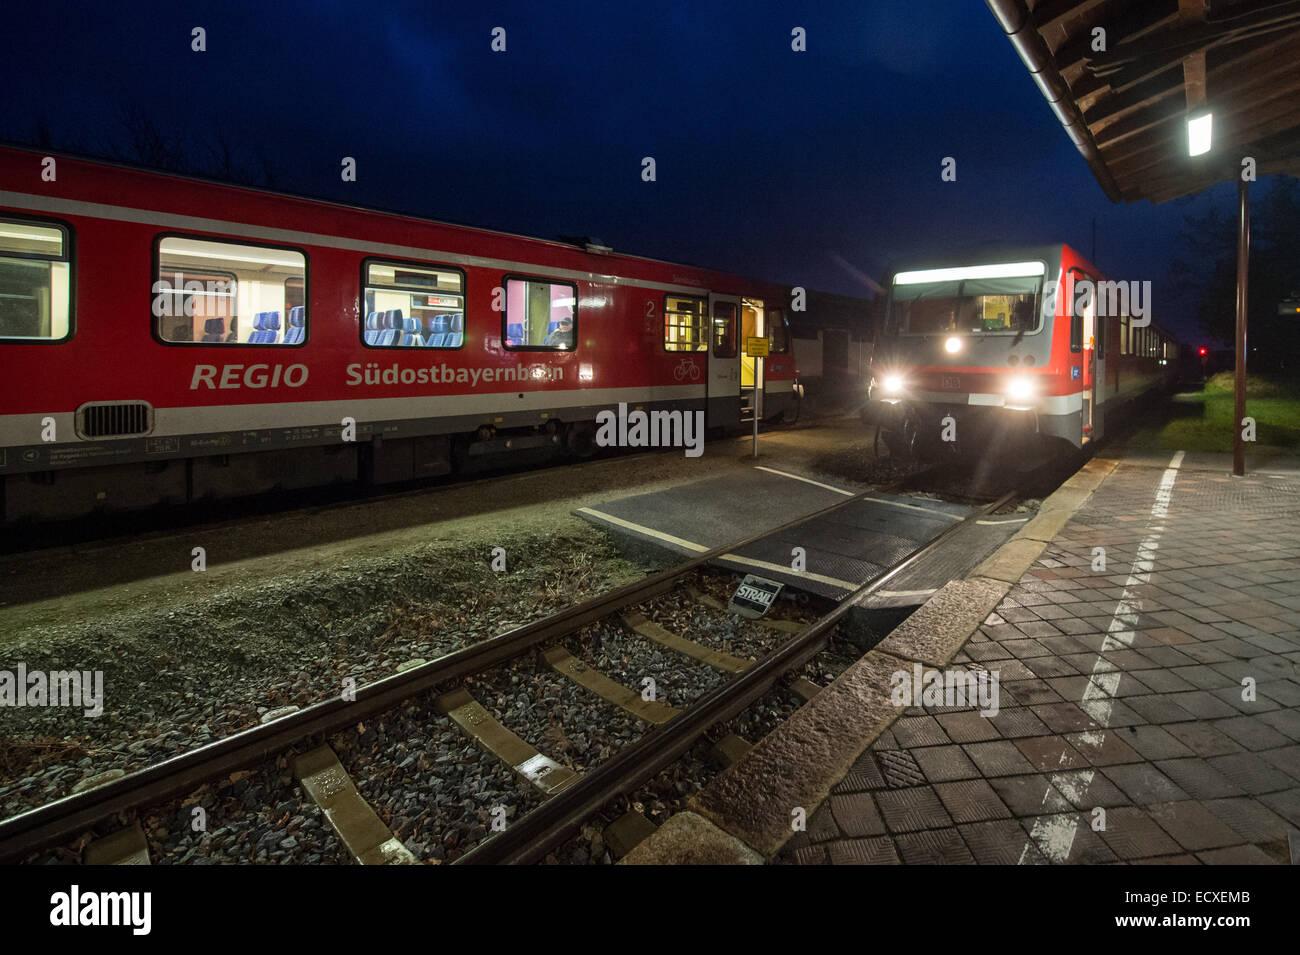 Niederlindhart, Germany. 21st Dec, 2014. Trains stand in the station of Niederlindhart, Germany, 21 December 2014. - Stock Image